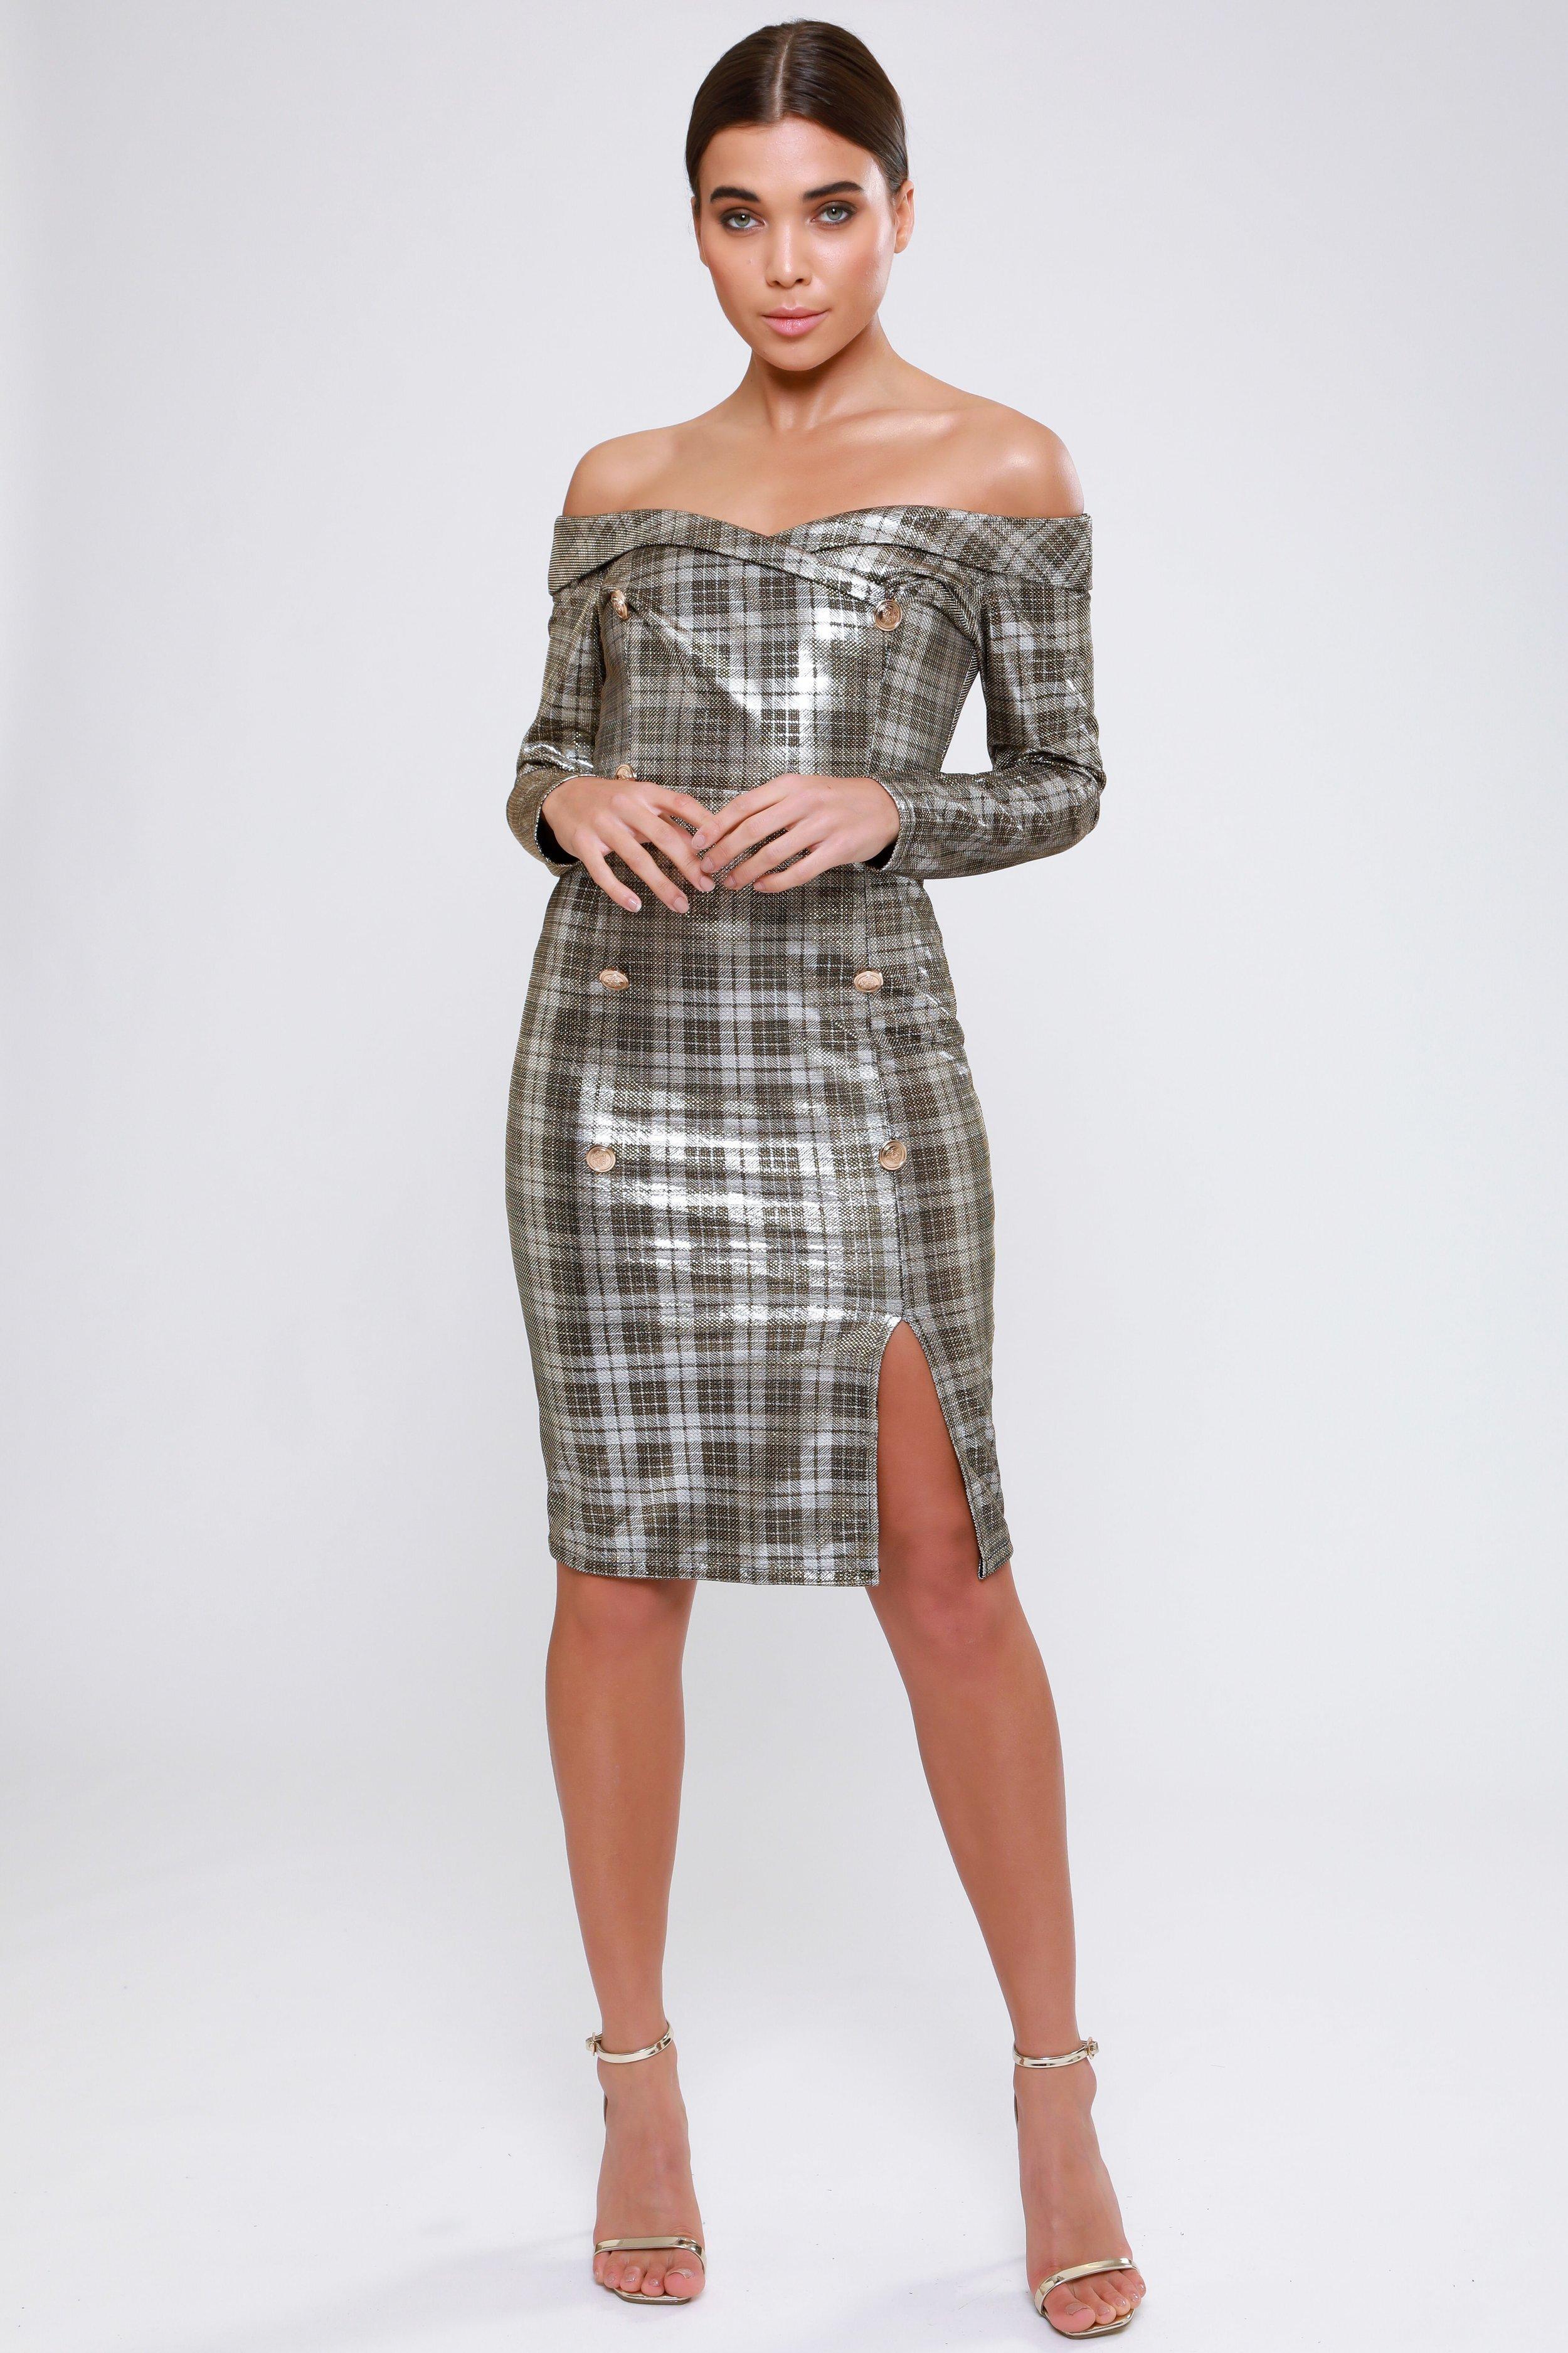 Metallic Check Bardot  Blazer Style Dress   £49.00